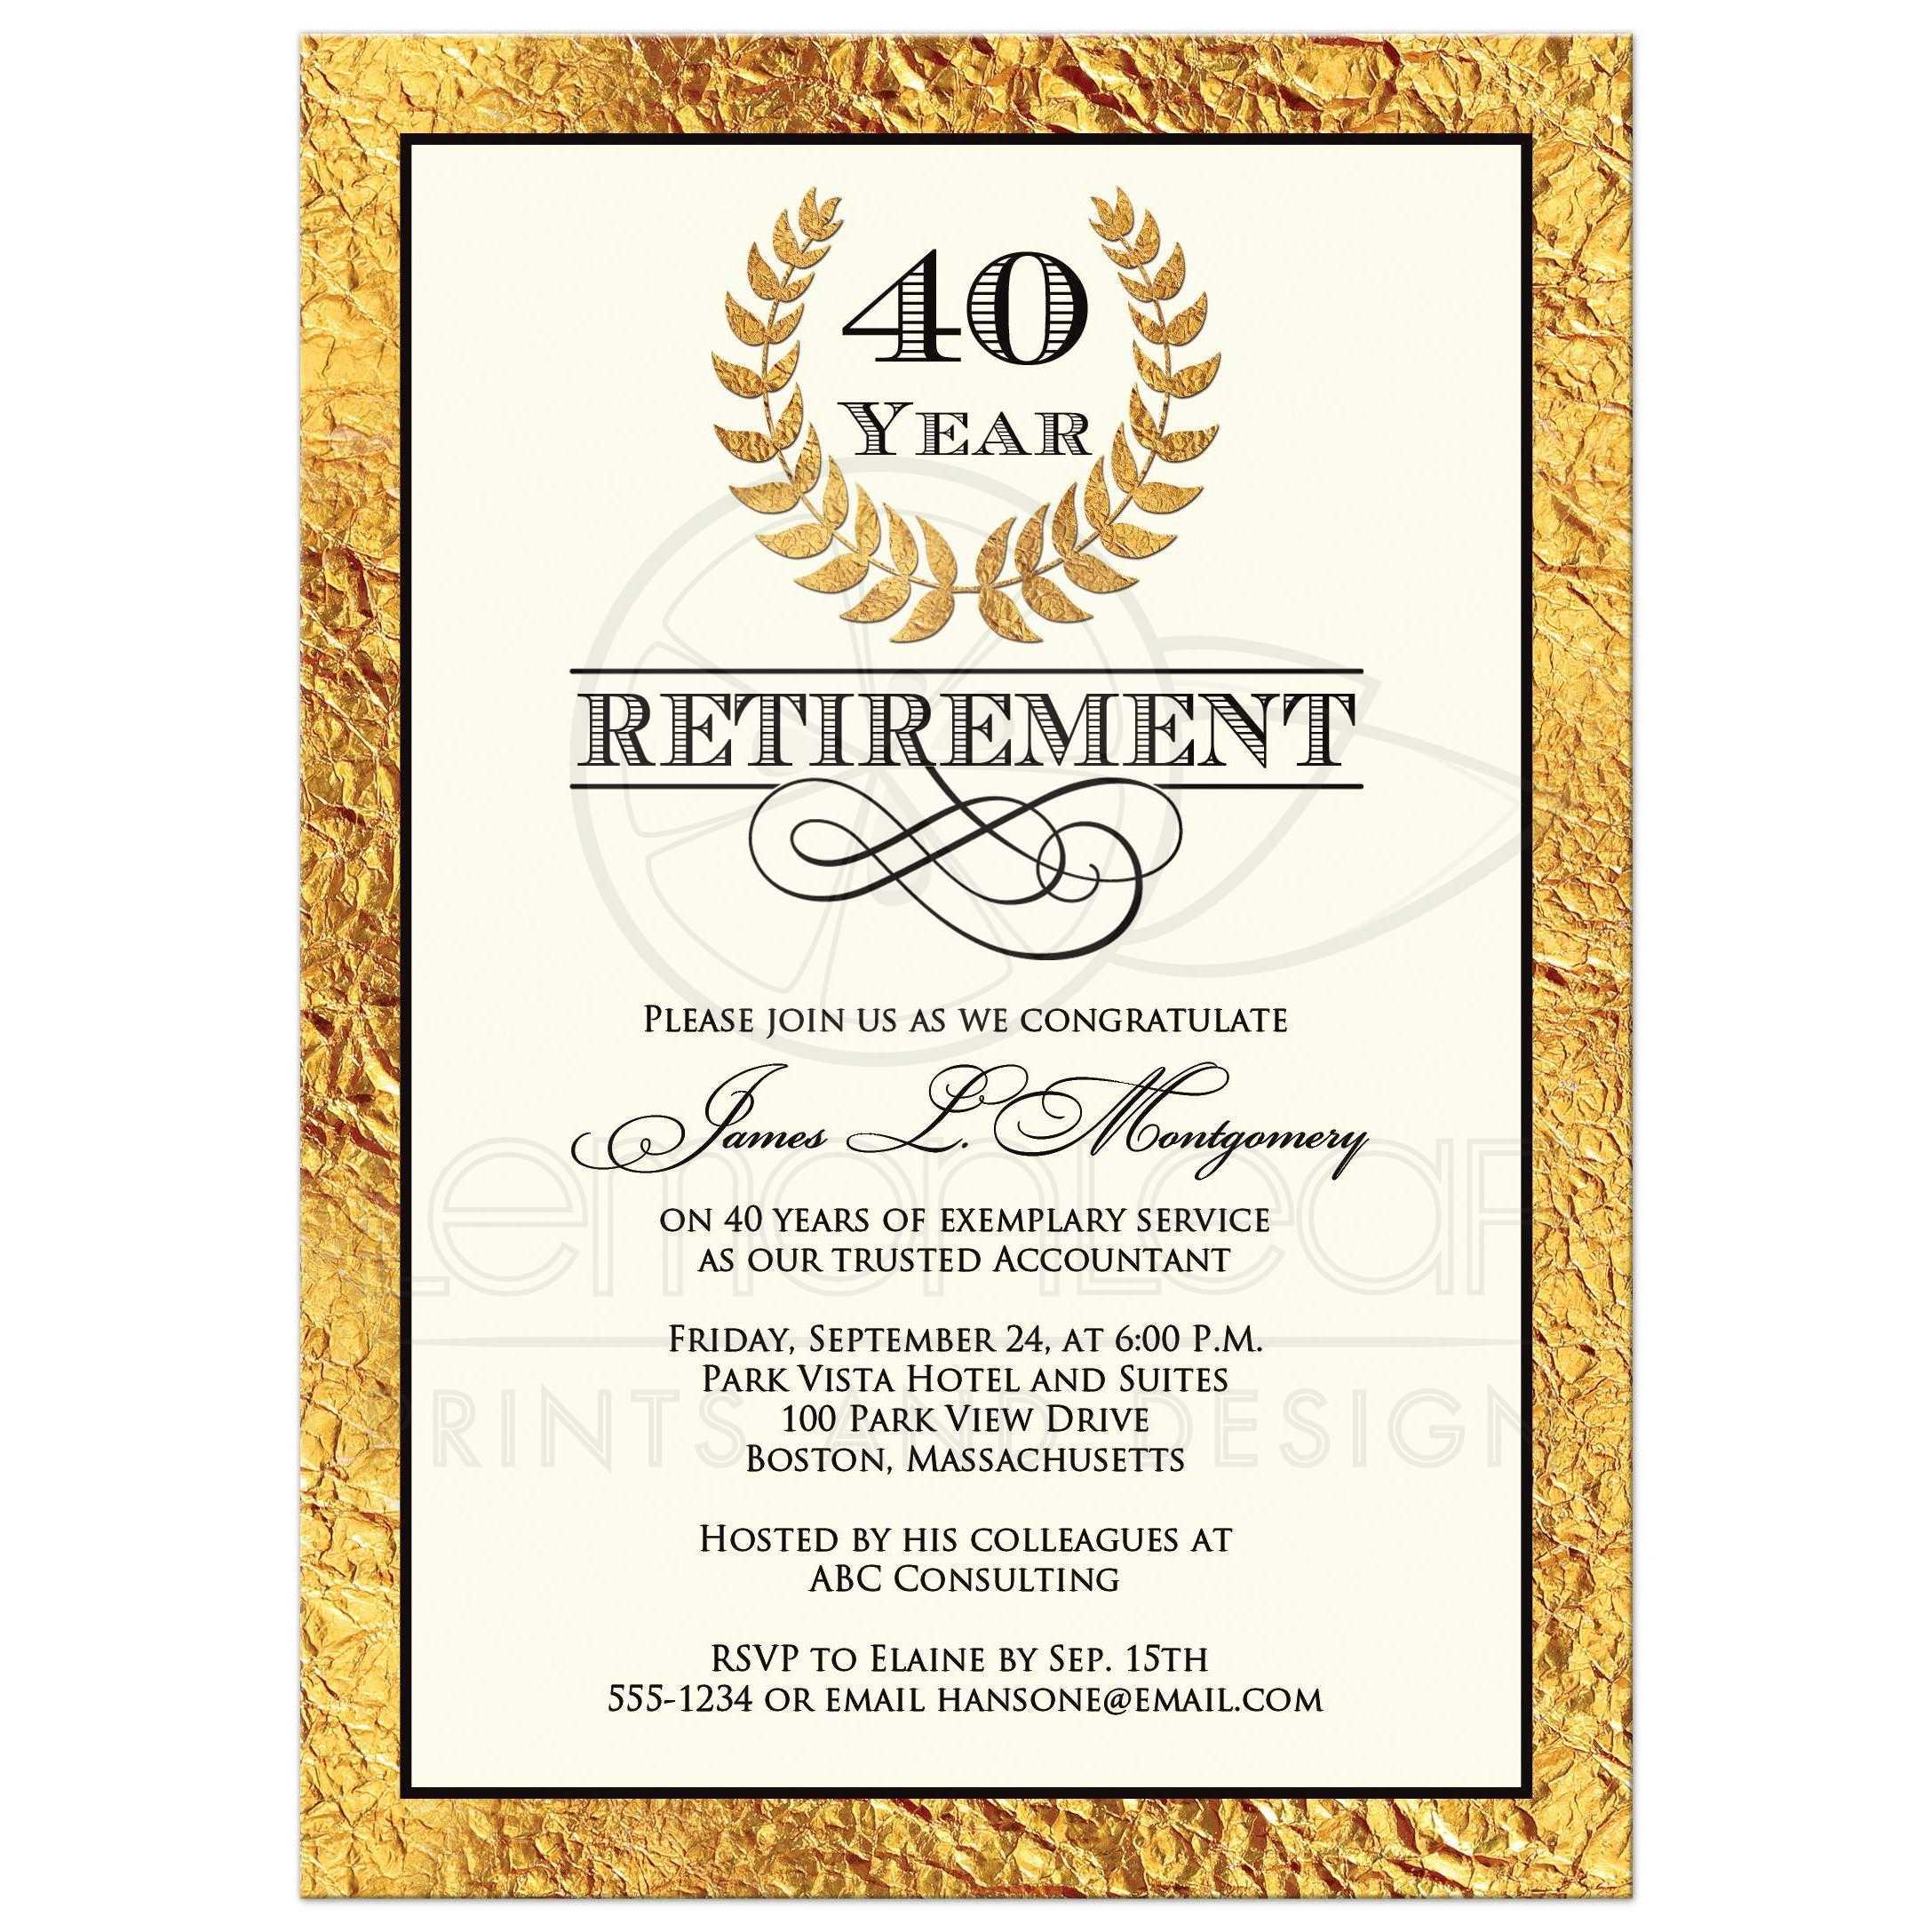 40 Year Retirement Party Invitation | Distinguished Faux Gold Foil | Laurel Wreath